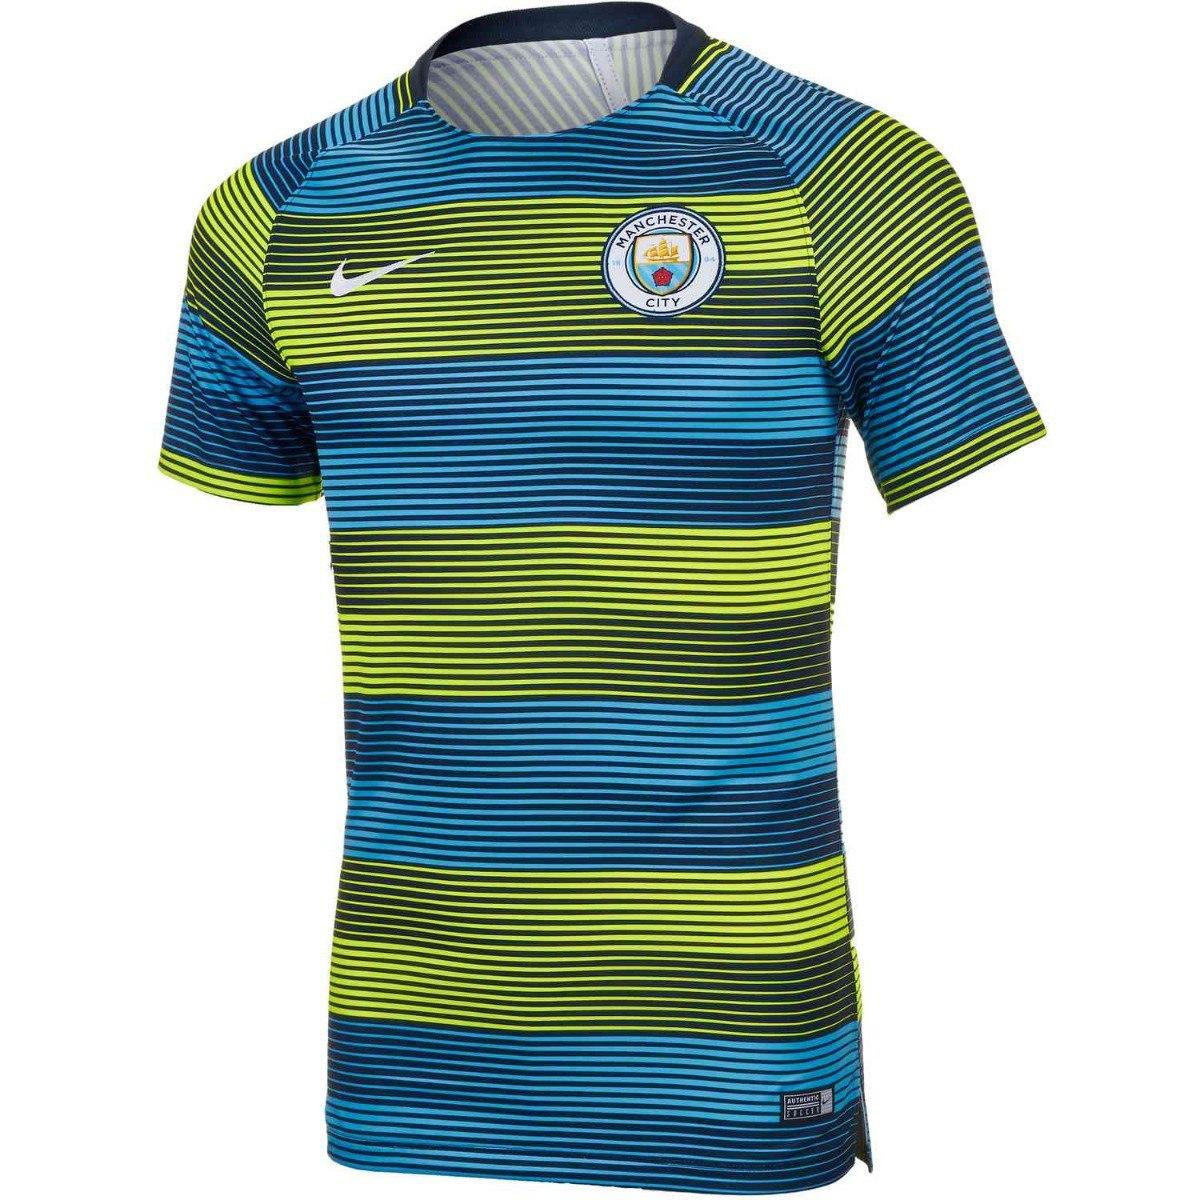 108a414504 Camisa Manchester City Treino ( Prona Entrega ) Prod. N br - R  139 ...